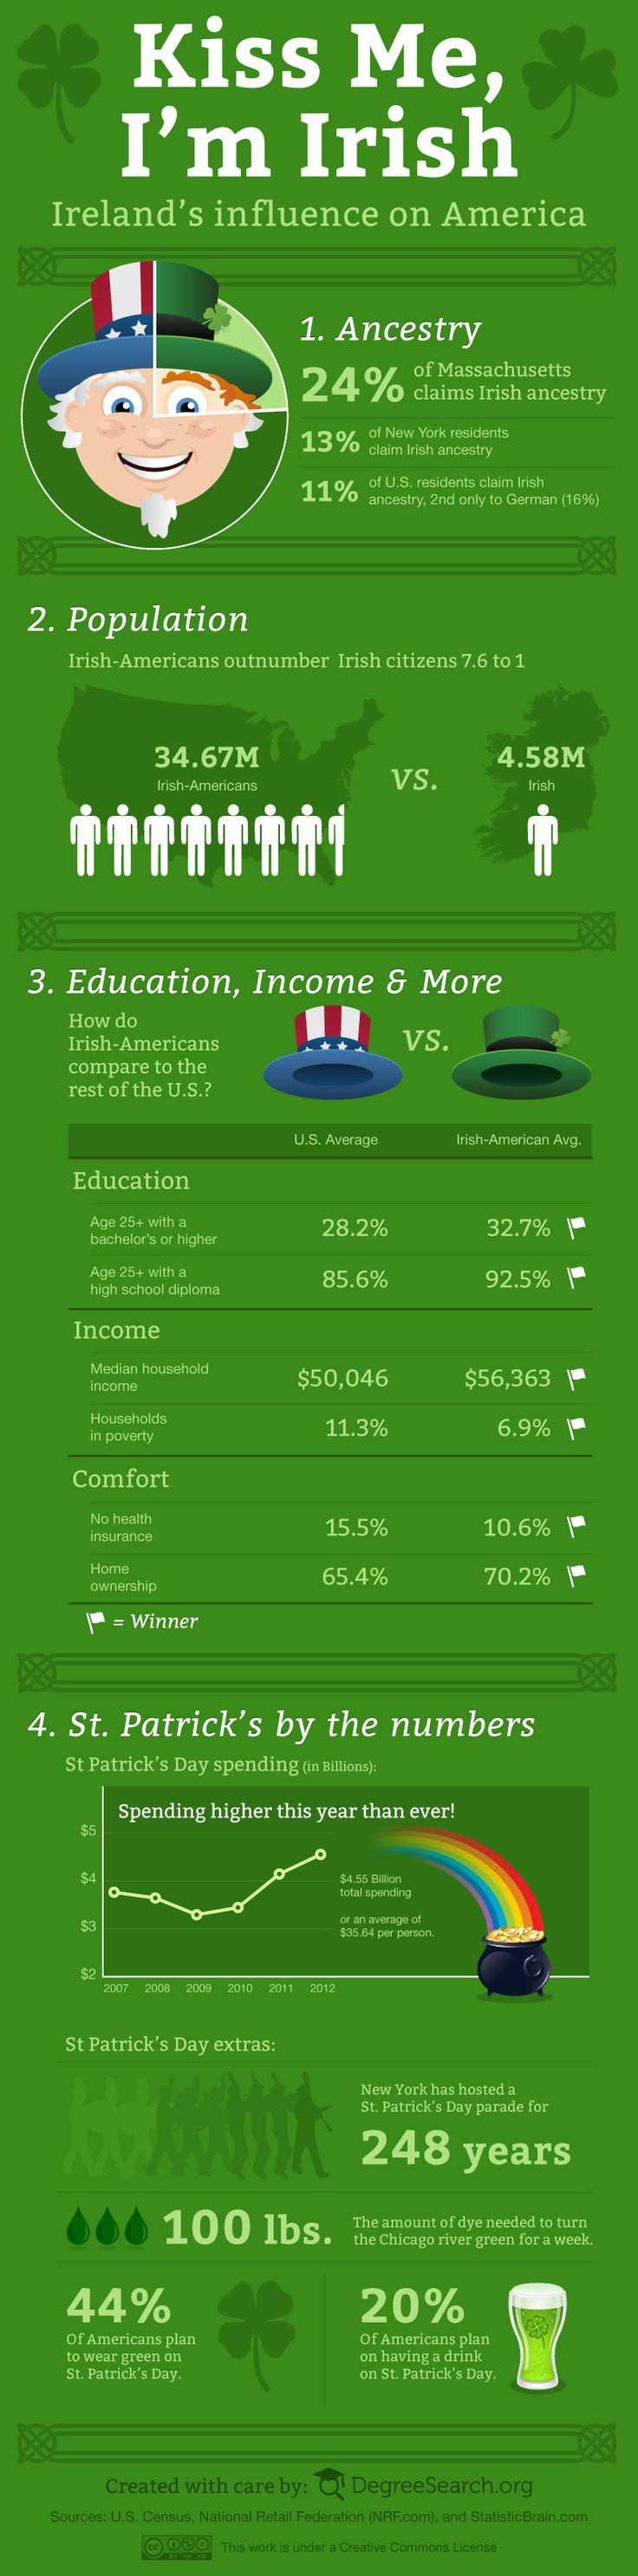 Kiss Me, I'm Irish – St. Patrick's Day 2012 [infographic] via DegreeSearch.org.